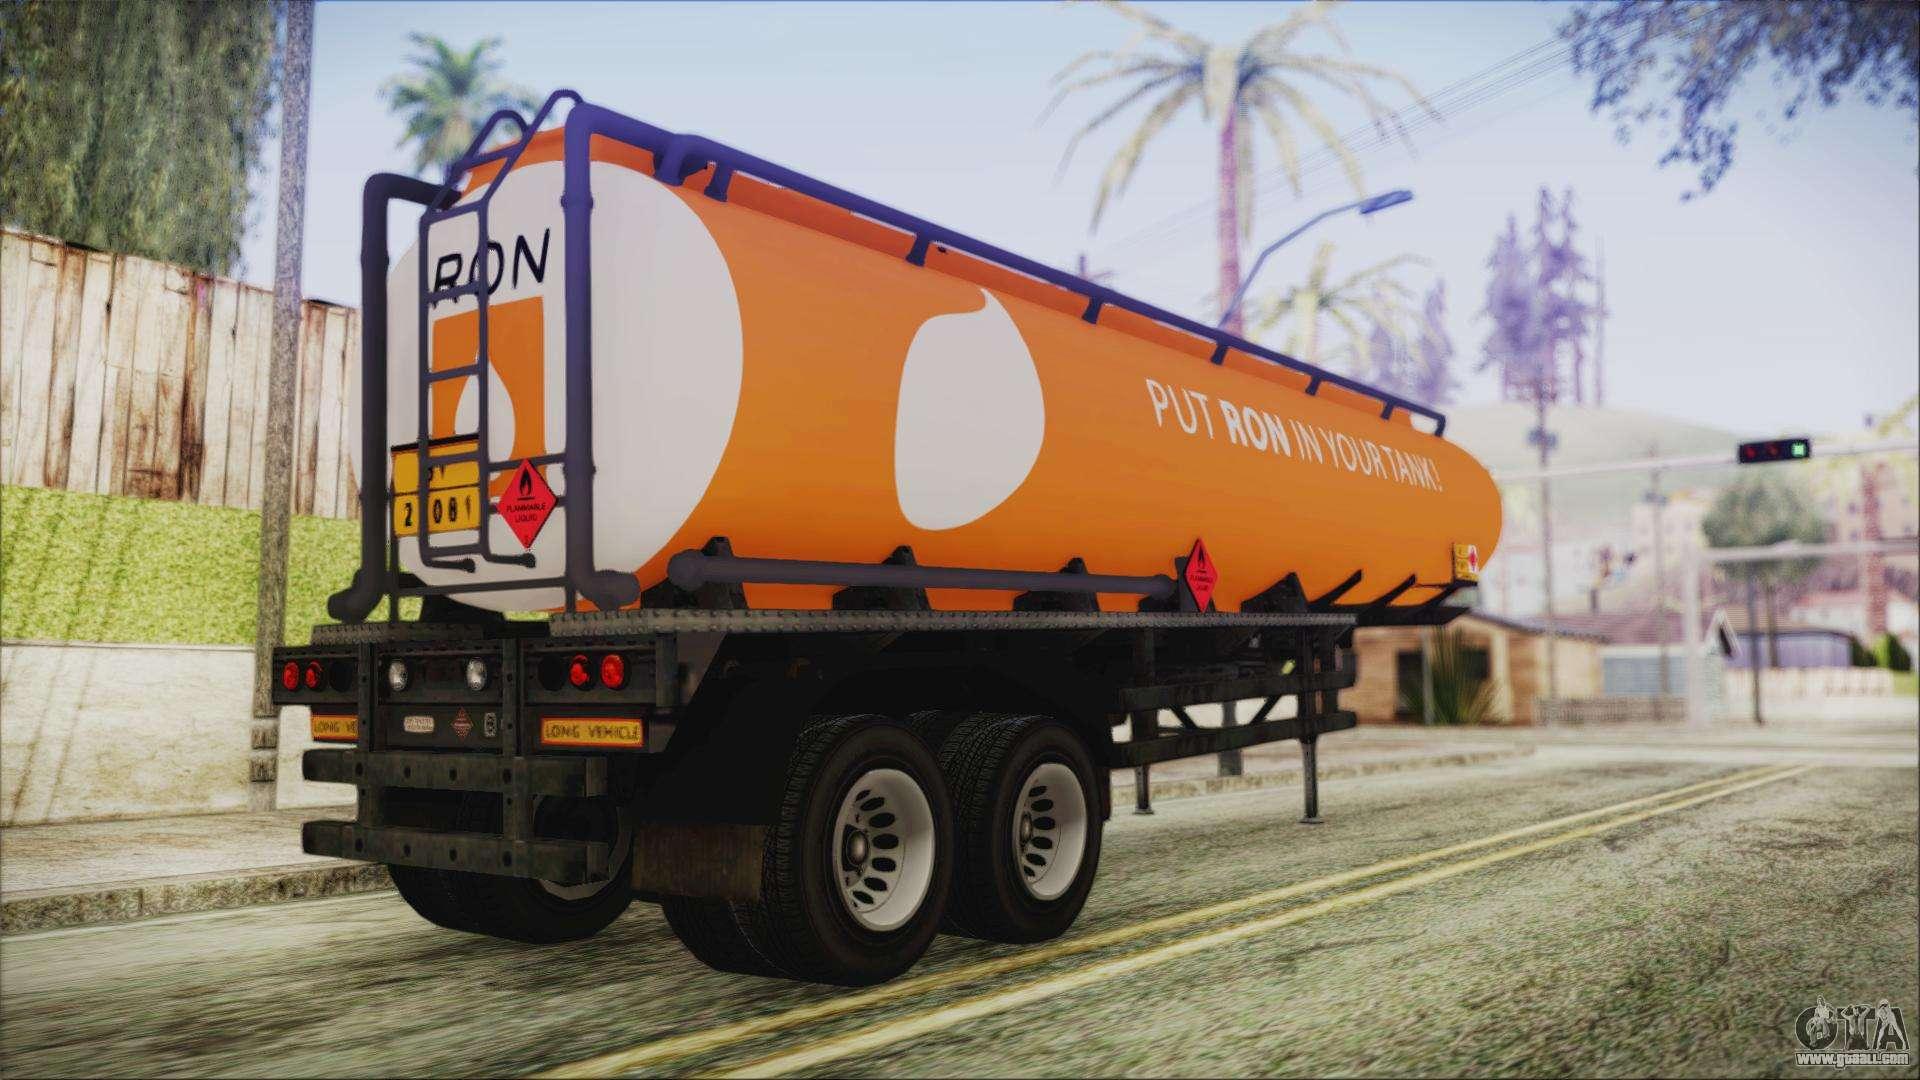 Smokey And The Bandit Trailer >> GTA 5 RON Tanker Trailer for GTA San Andreas